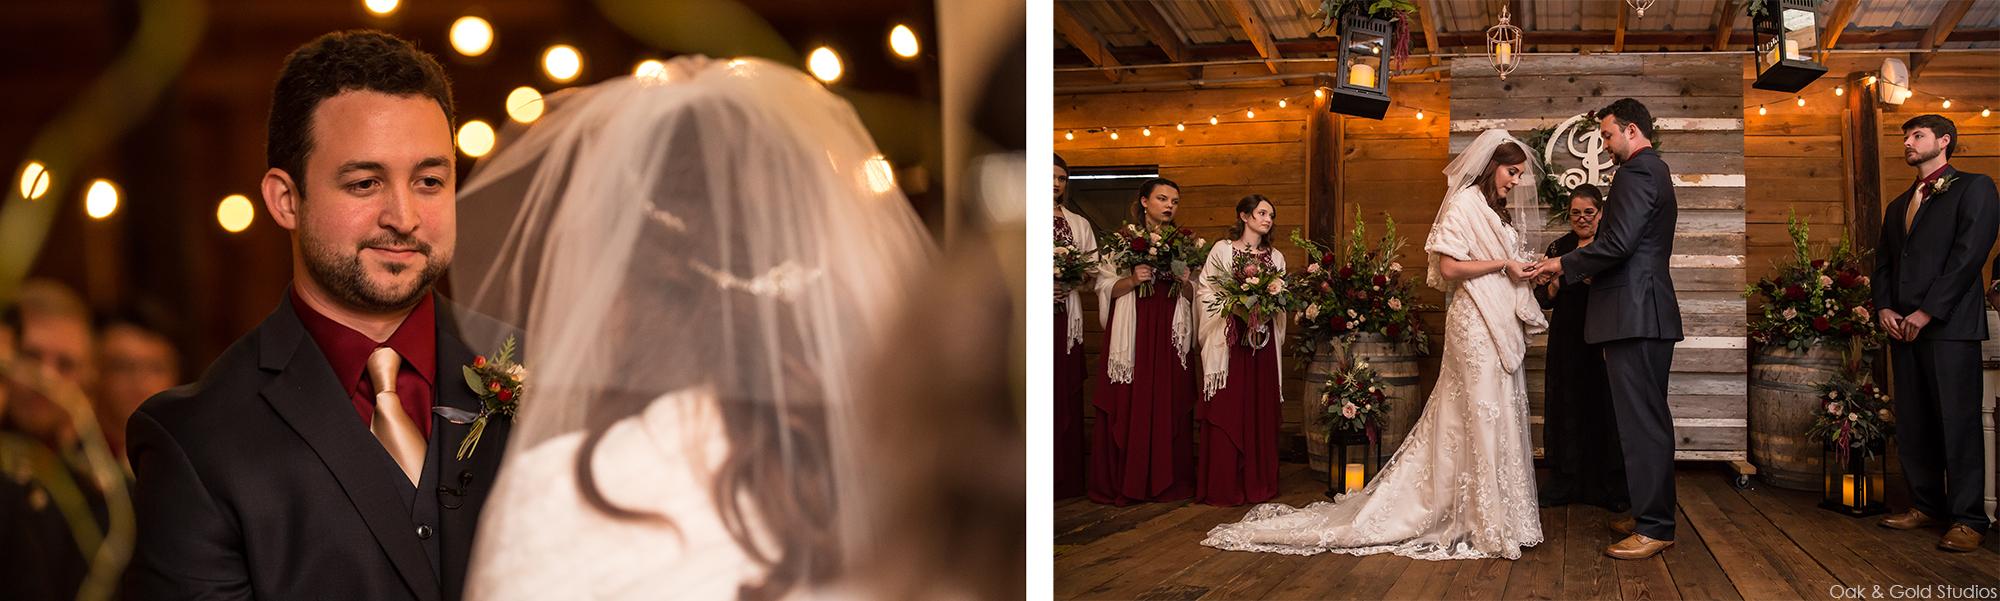 vinewood-plantation-winter-wedding.jpg